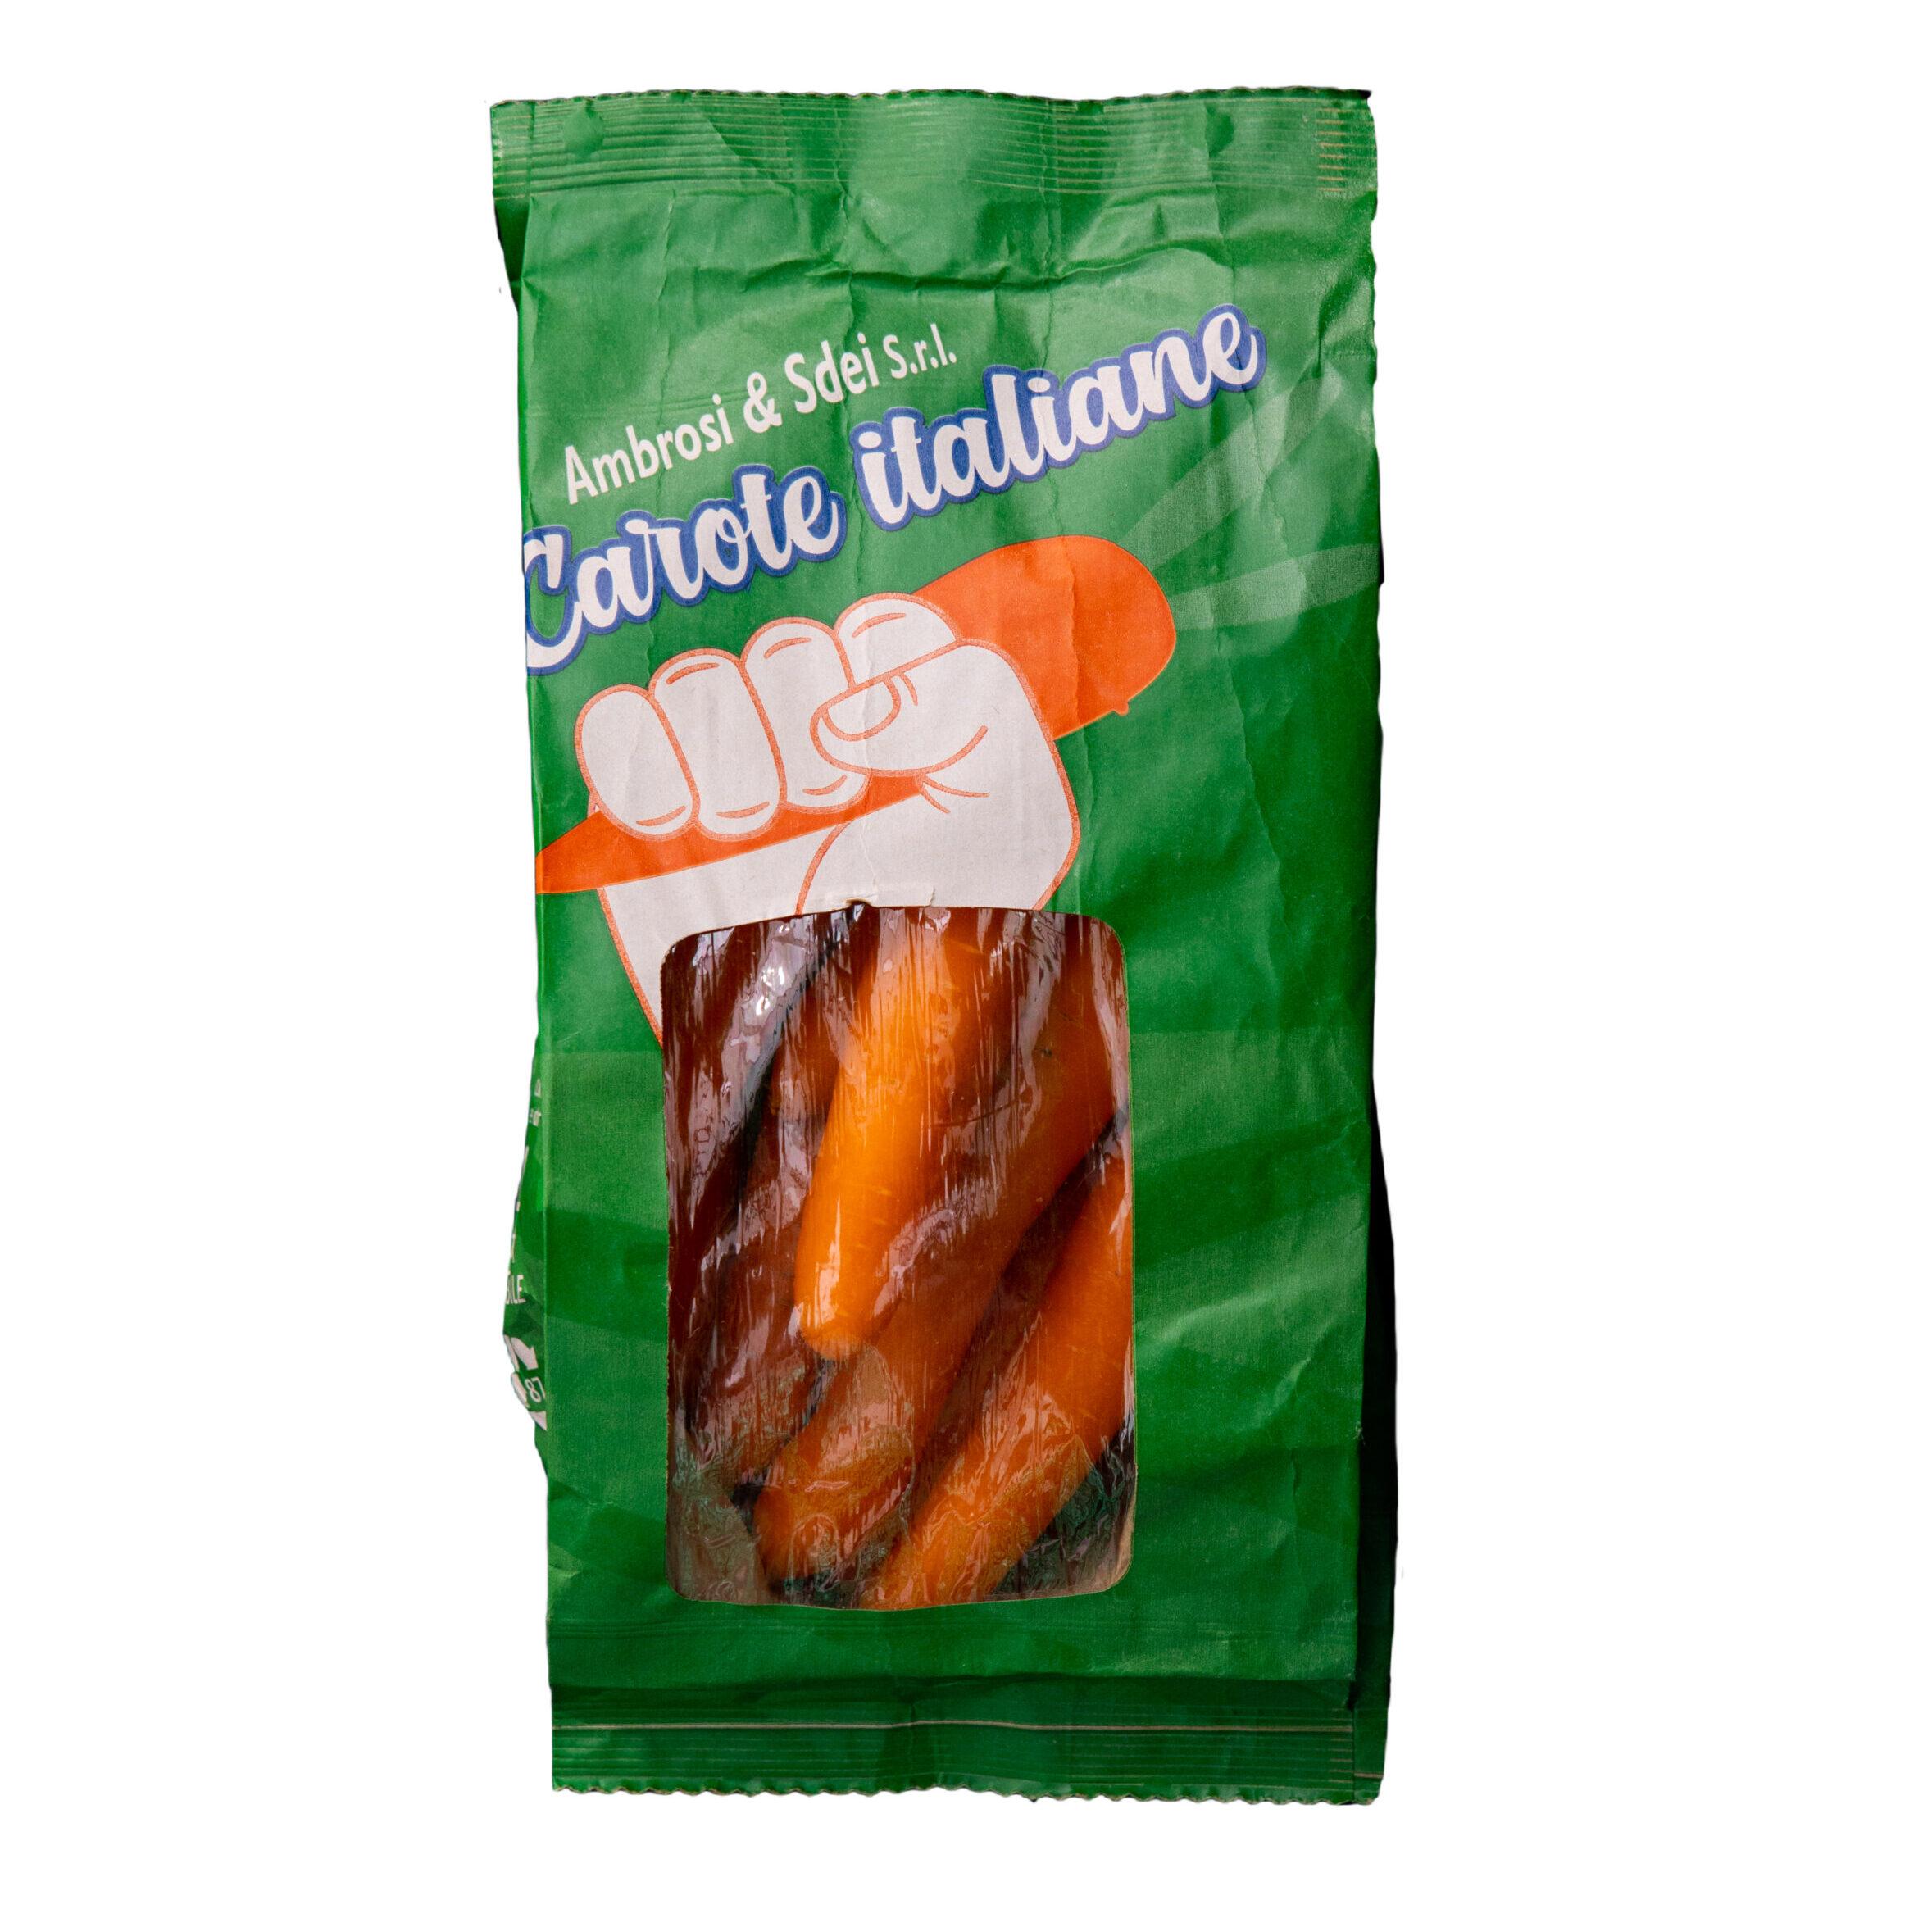 sacchetto-carta-carote